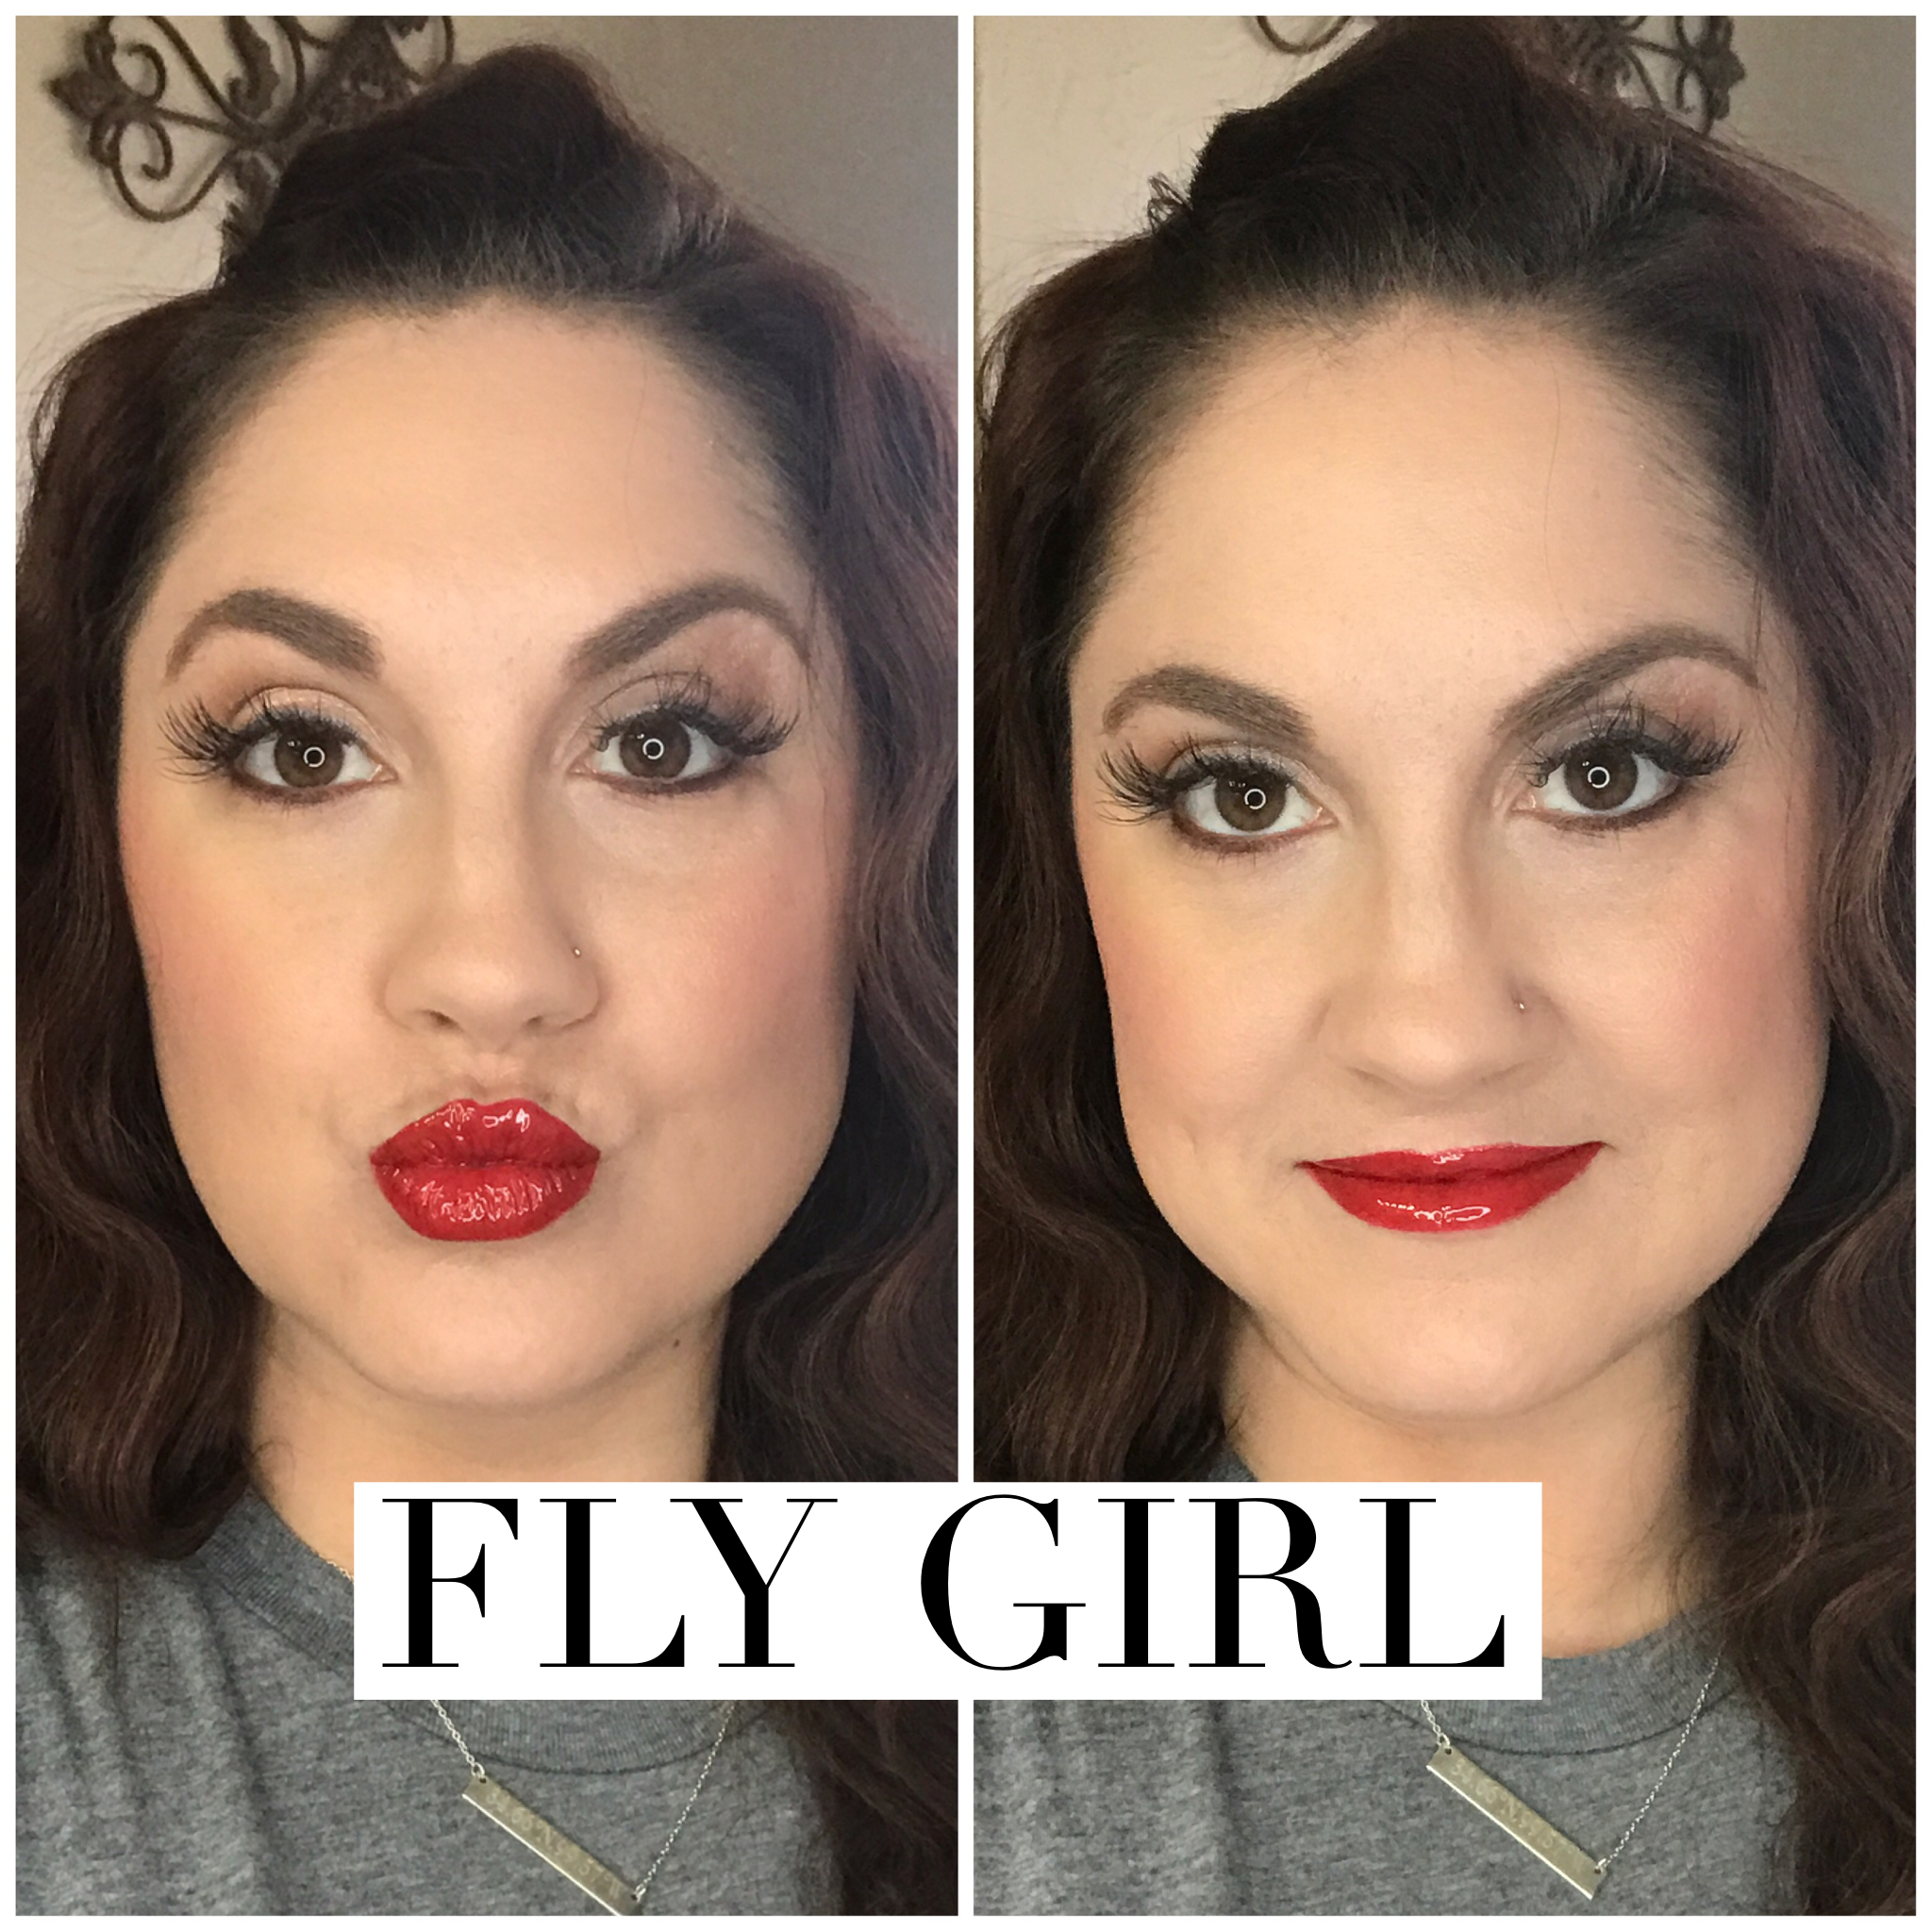 Fly Girl LipSenseKiss and Makeup Cosmetics Fly girl